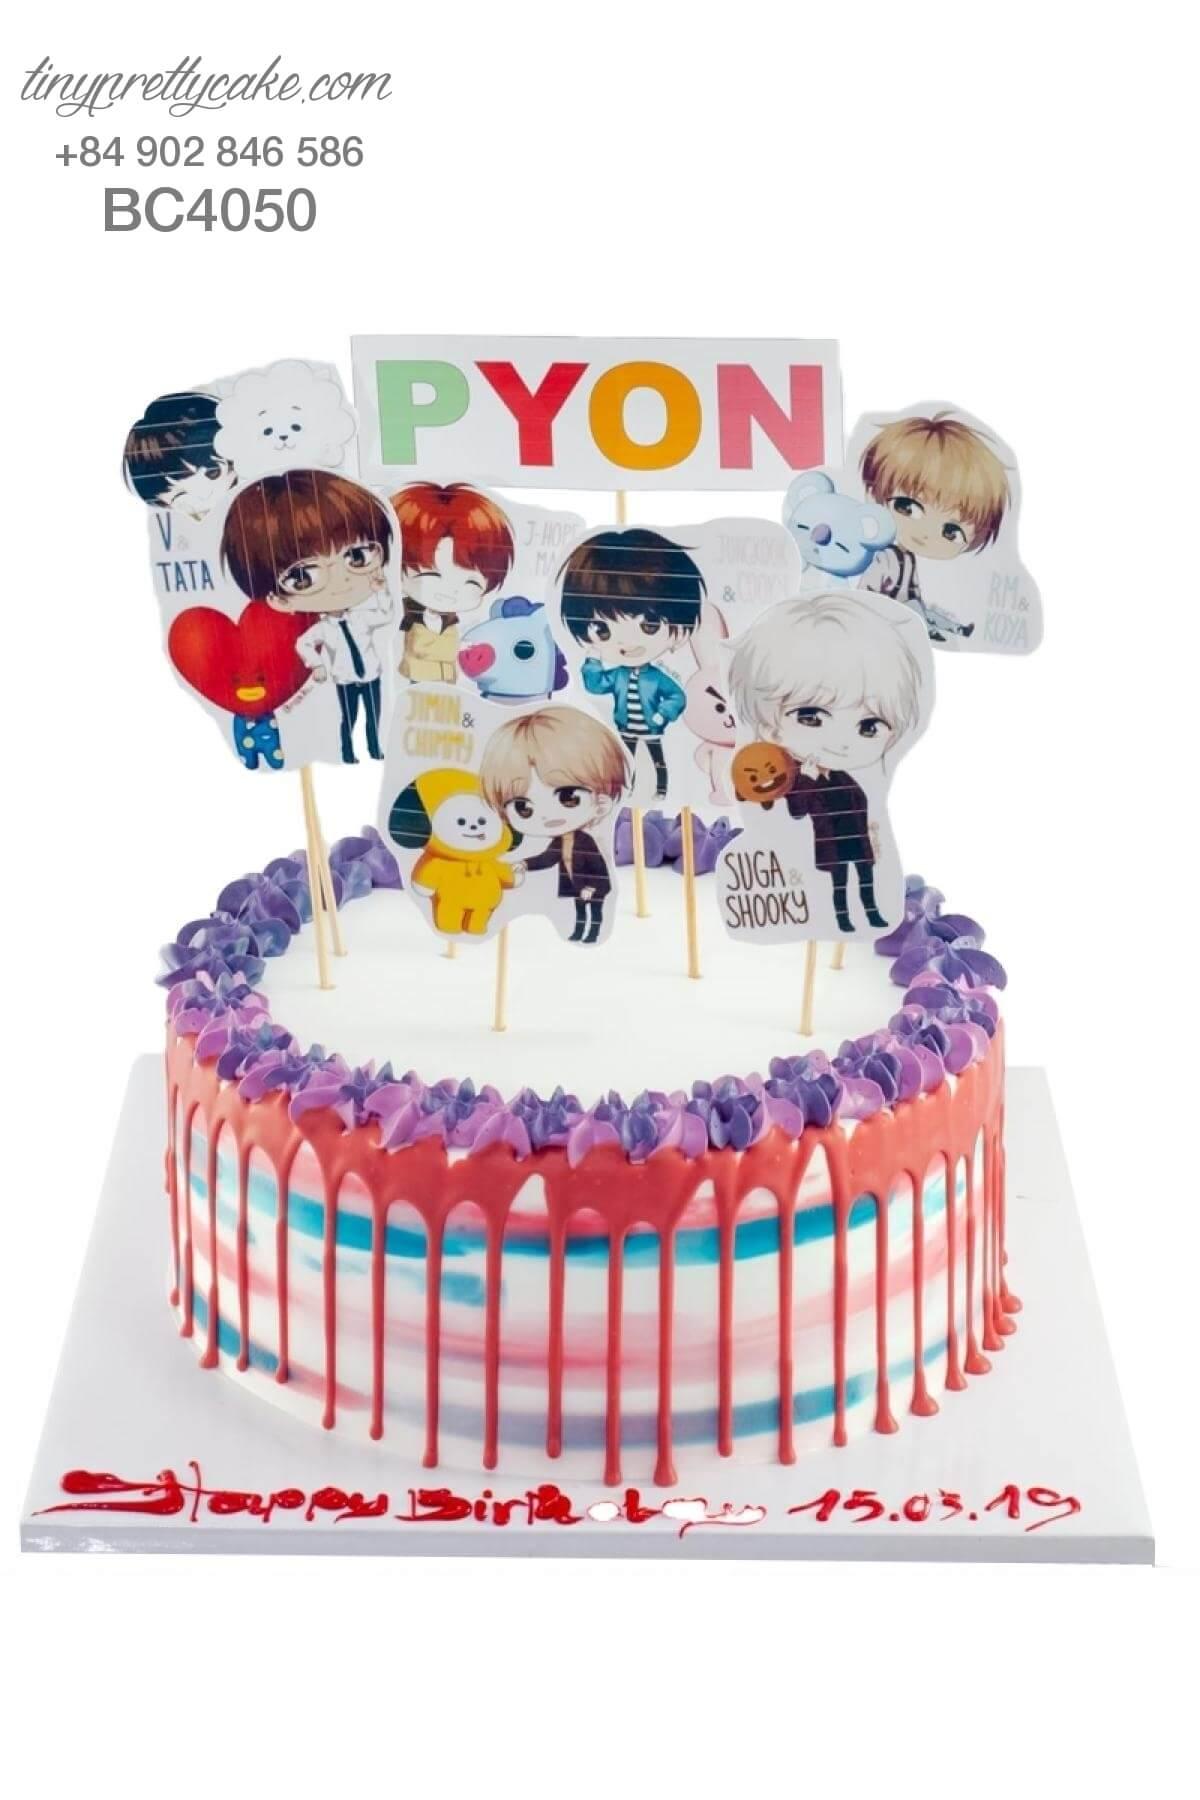 mua bánh sinh nhật BTS